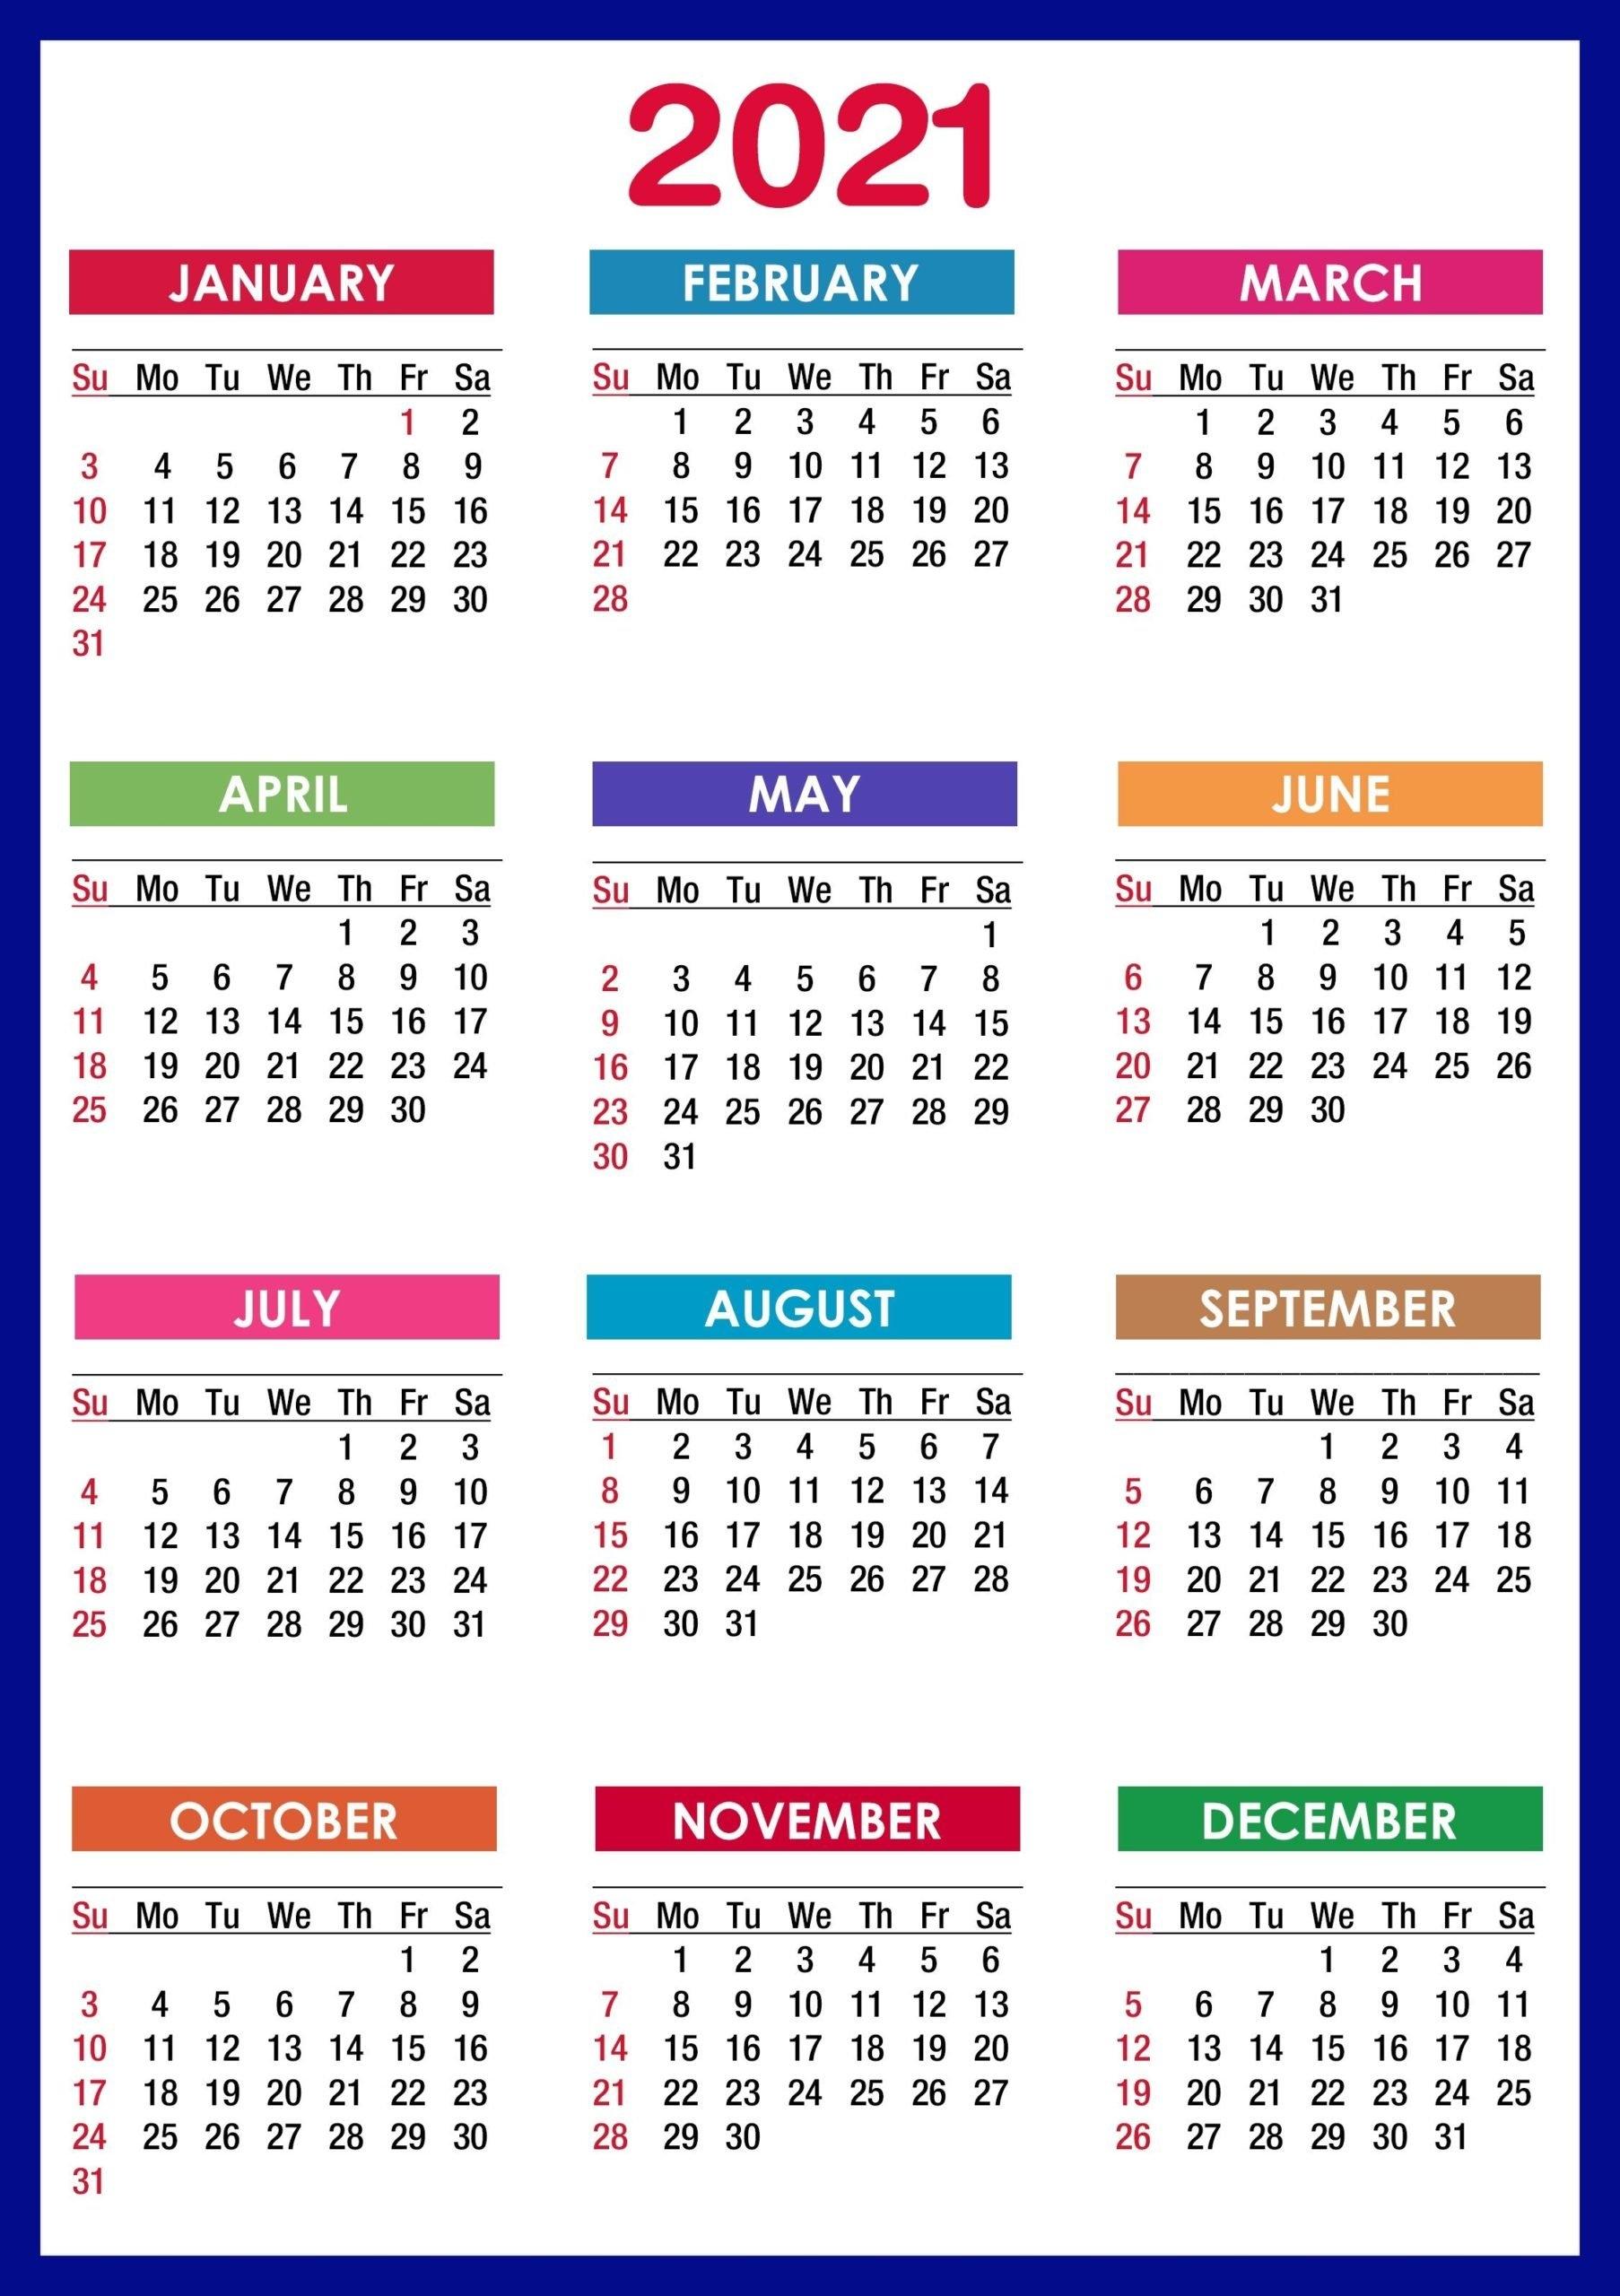 2021 Calendar Printable   12 Months All In One   Calendar 2021 with regard to Calendar 2021 Design In Illustrator